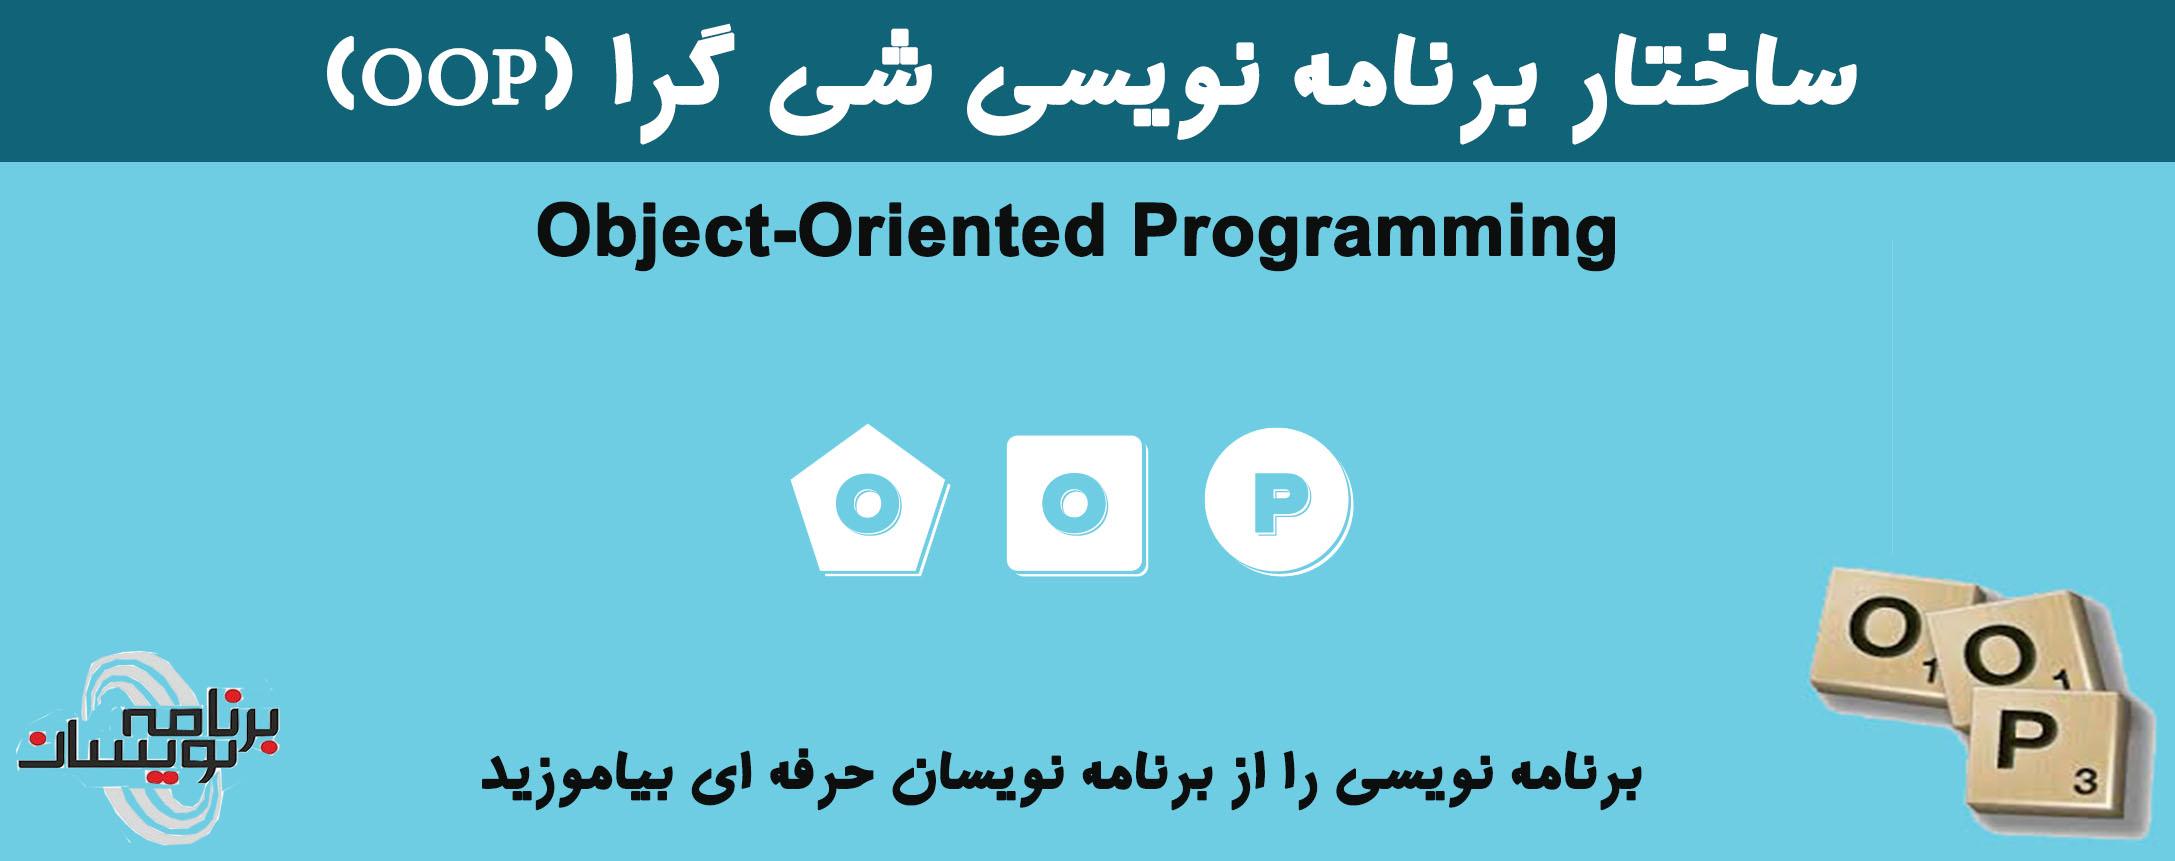 ساختار برنامه نویسی شی گرا (OOP)